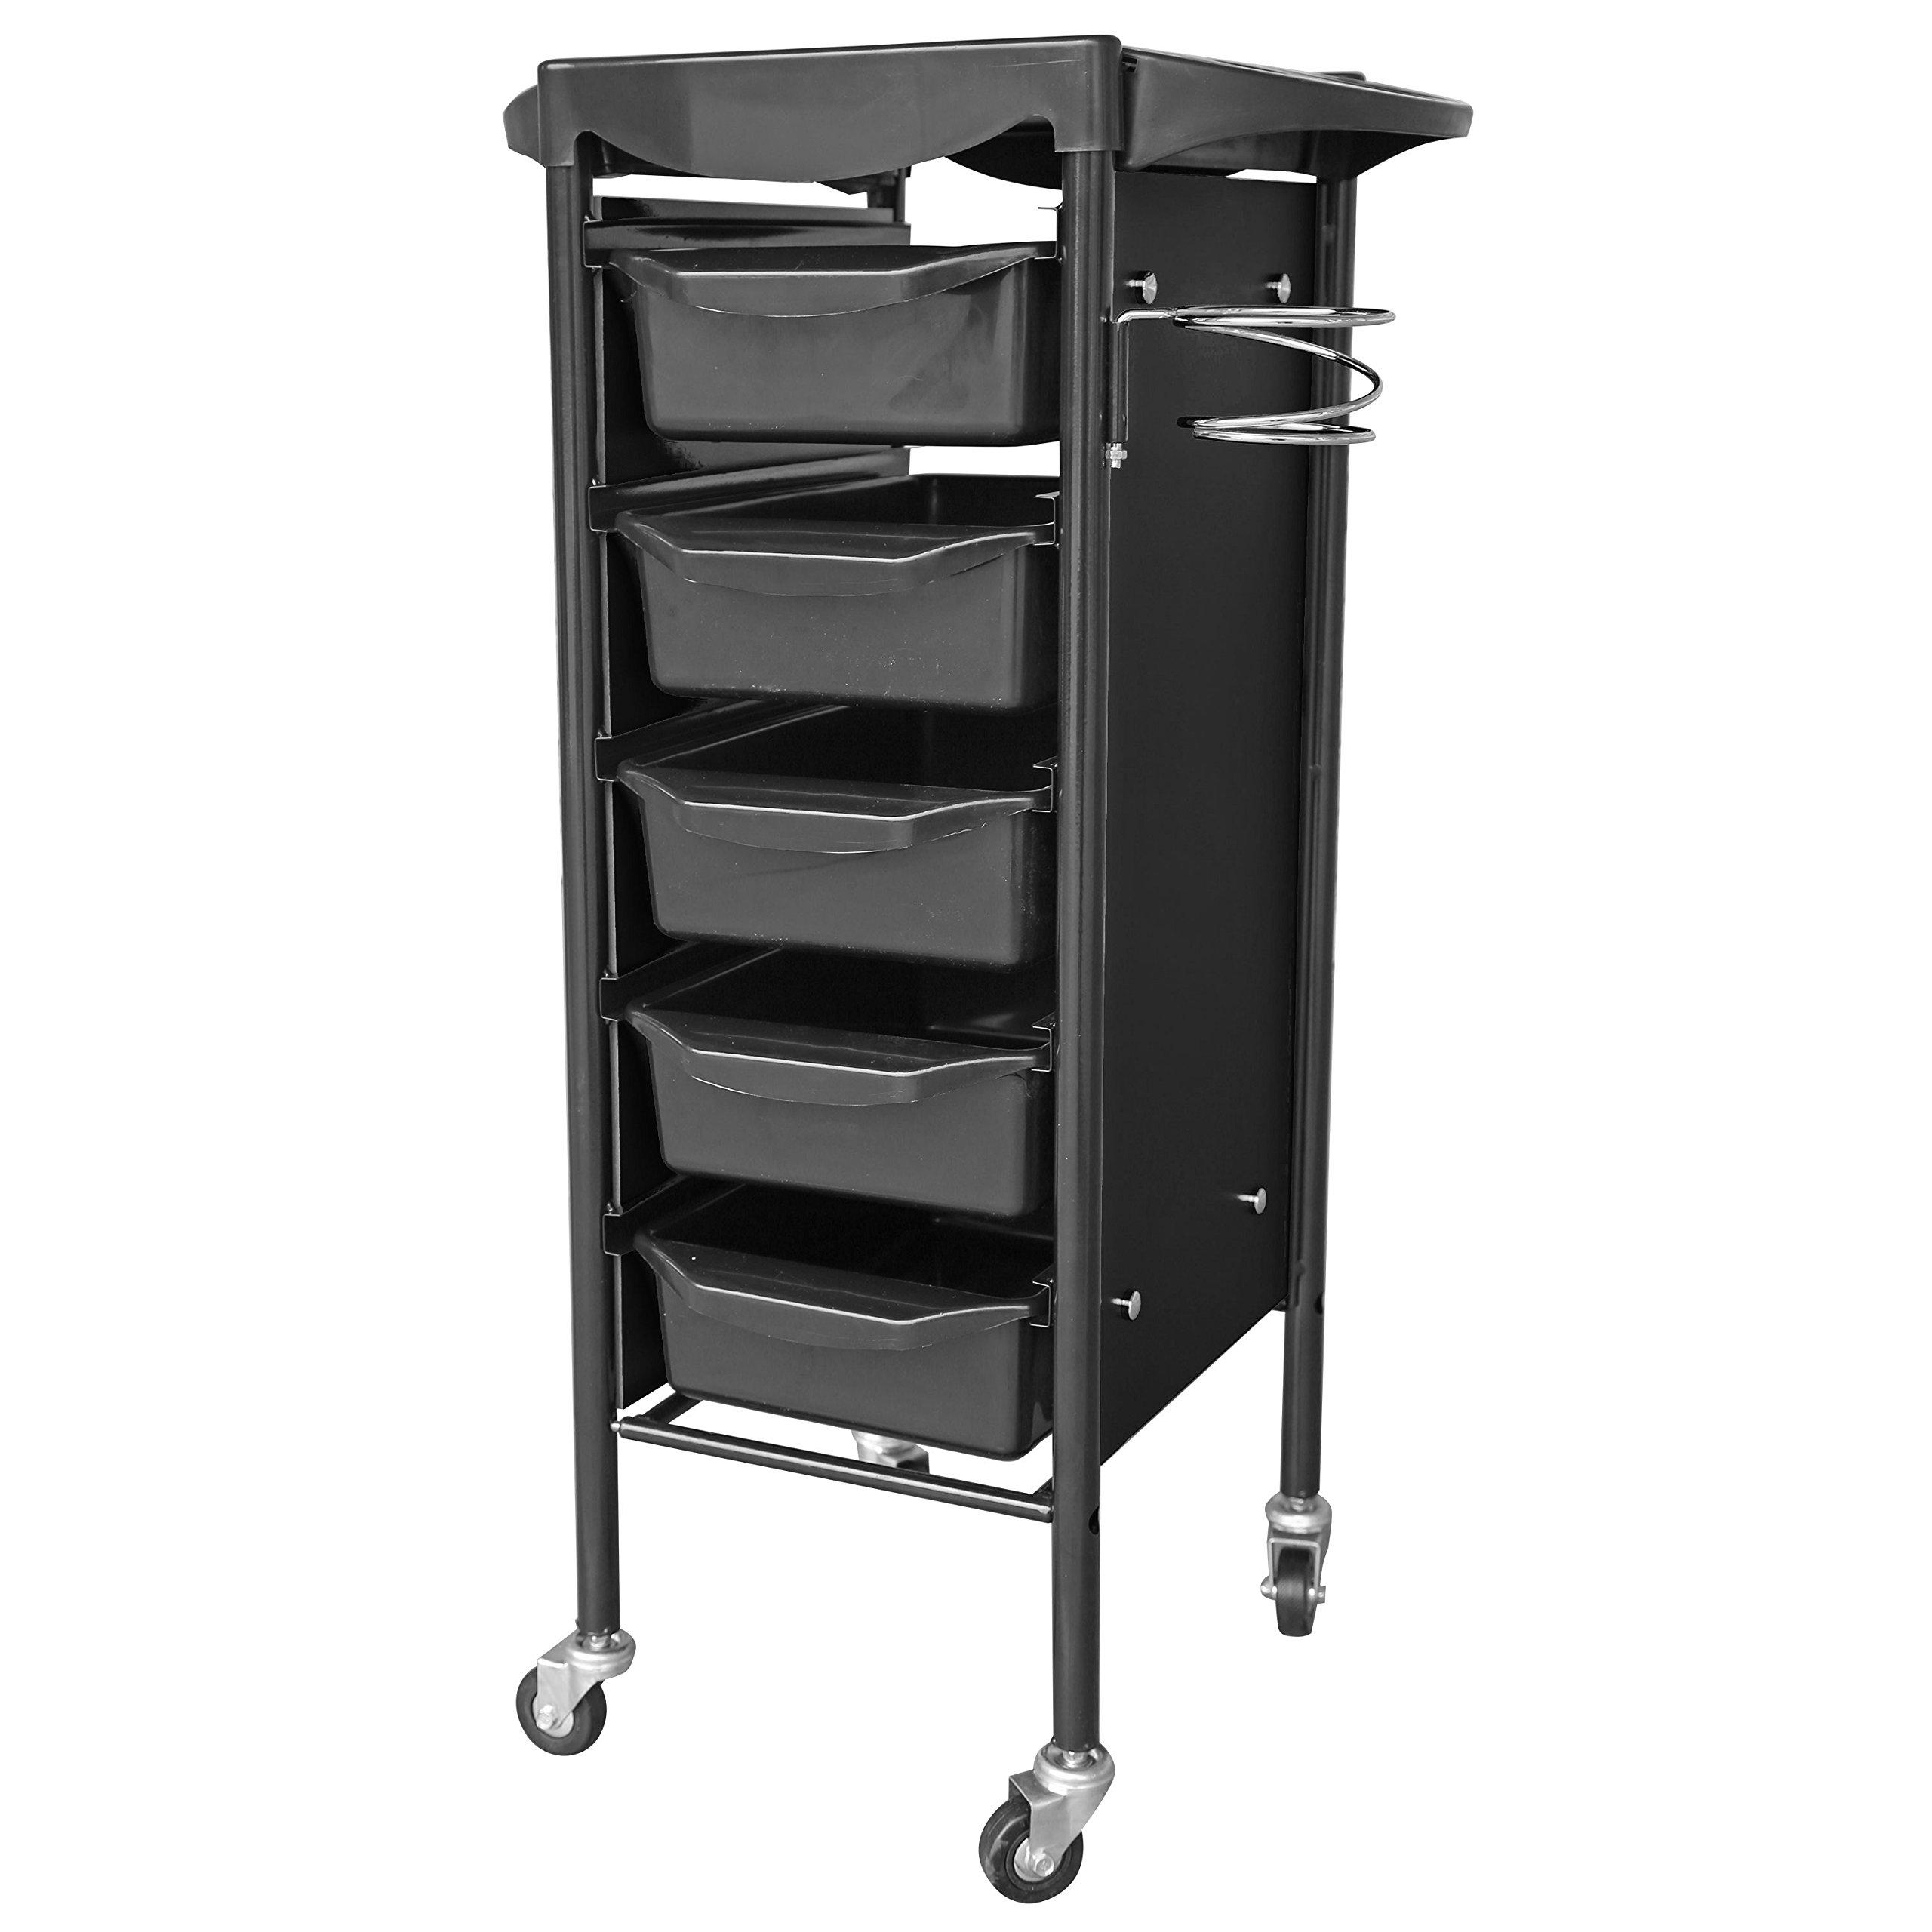 crownroyaljack Beauty Salon Rolling Trolley Storage Cart with 5 Removable Drawer, Black 02